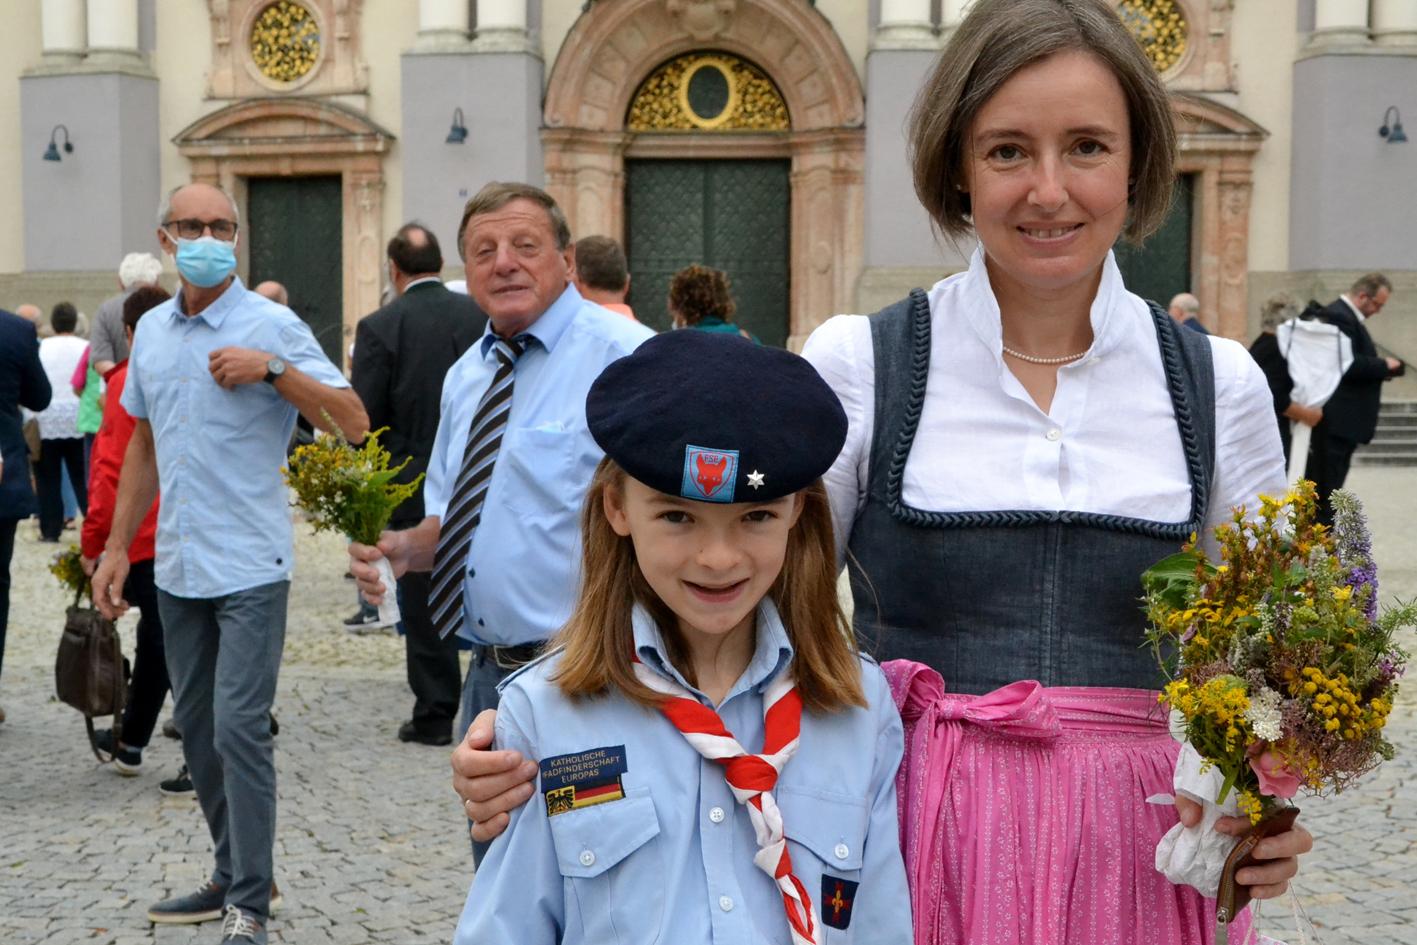 2020 08 15 aoelfb mariae himmelfahrt aoe2020 impressionen 7